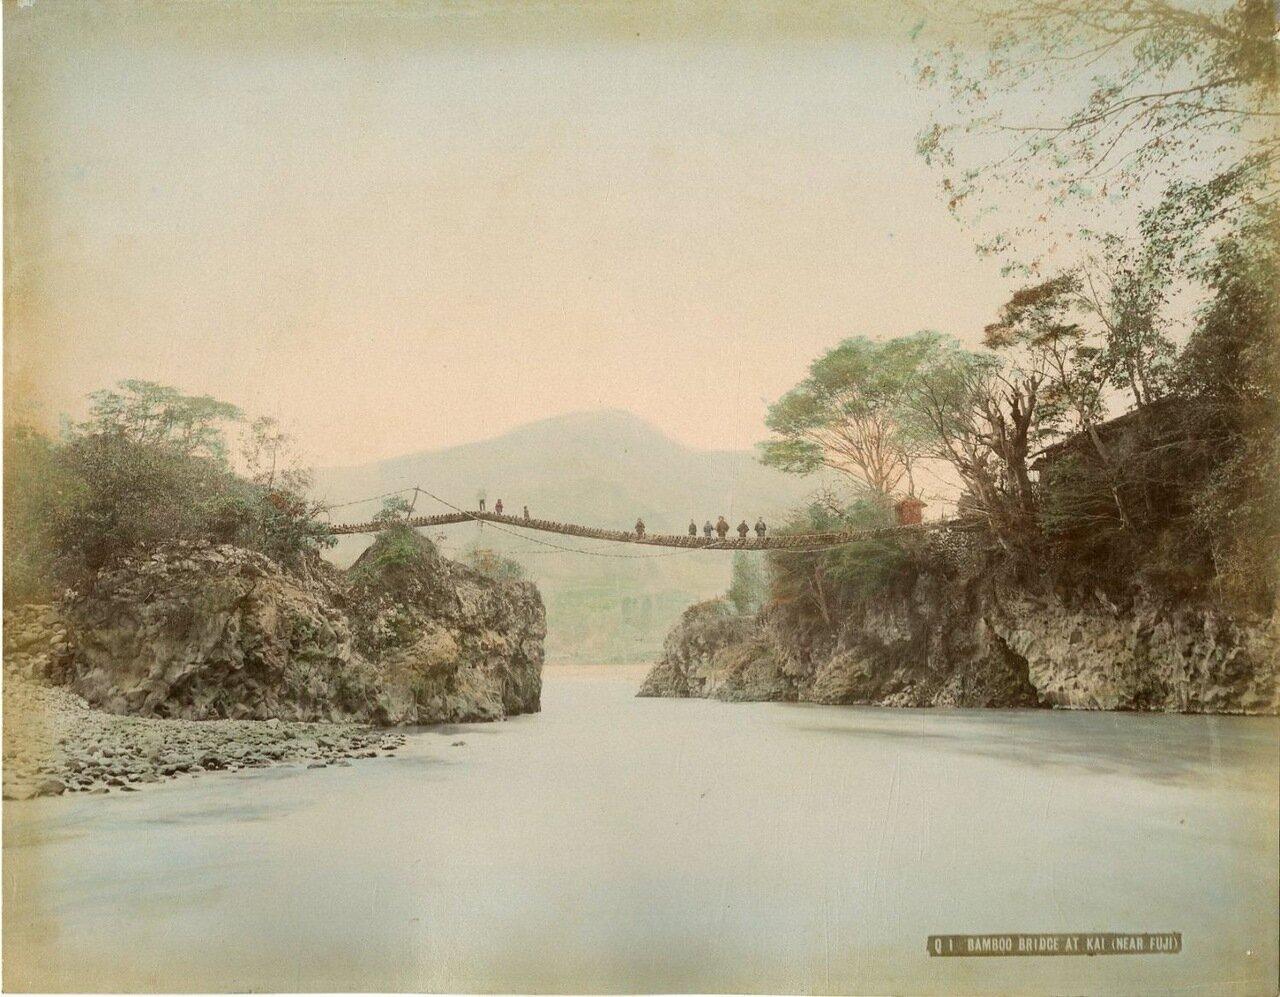 Бамбуковый мост Кай вблизи Фудзи